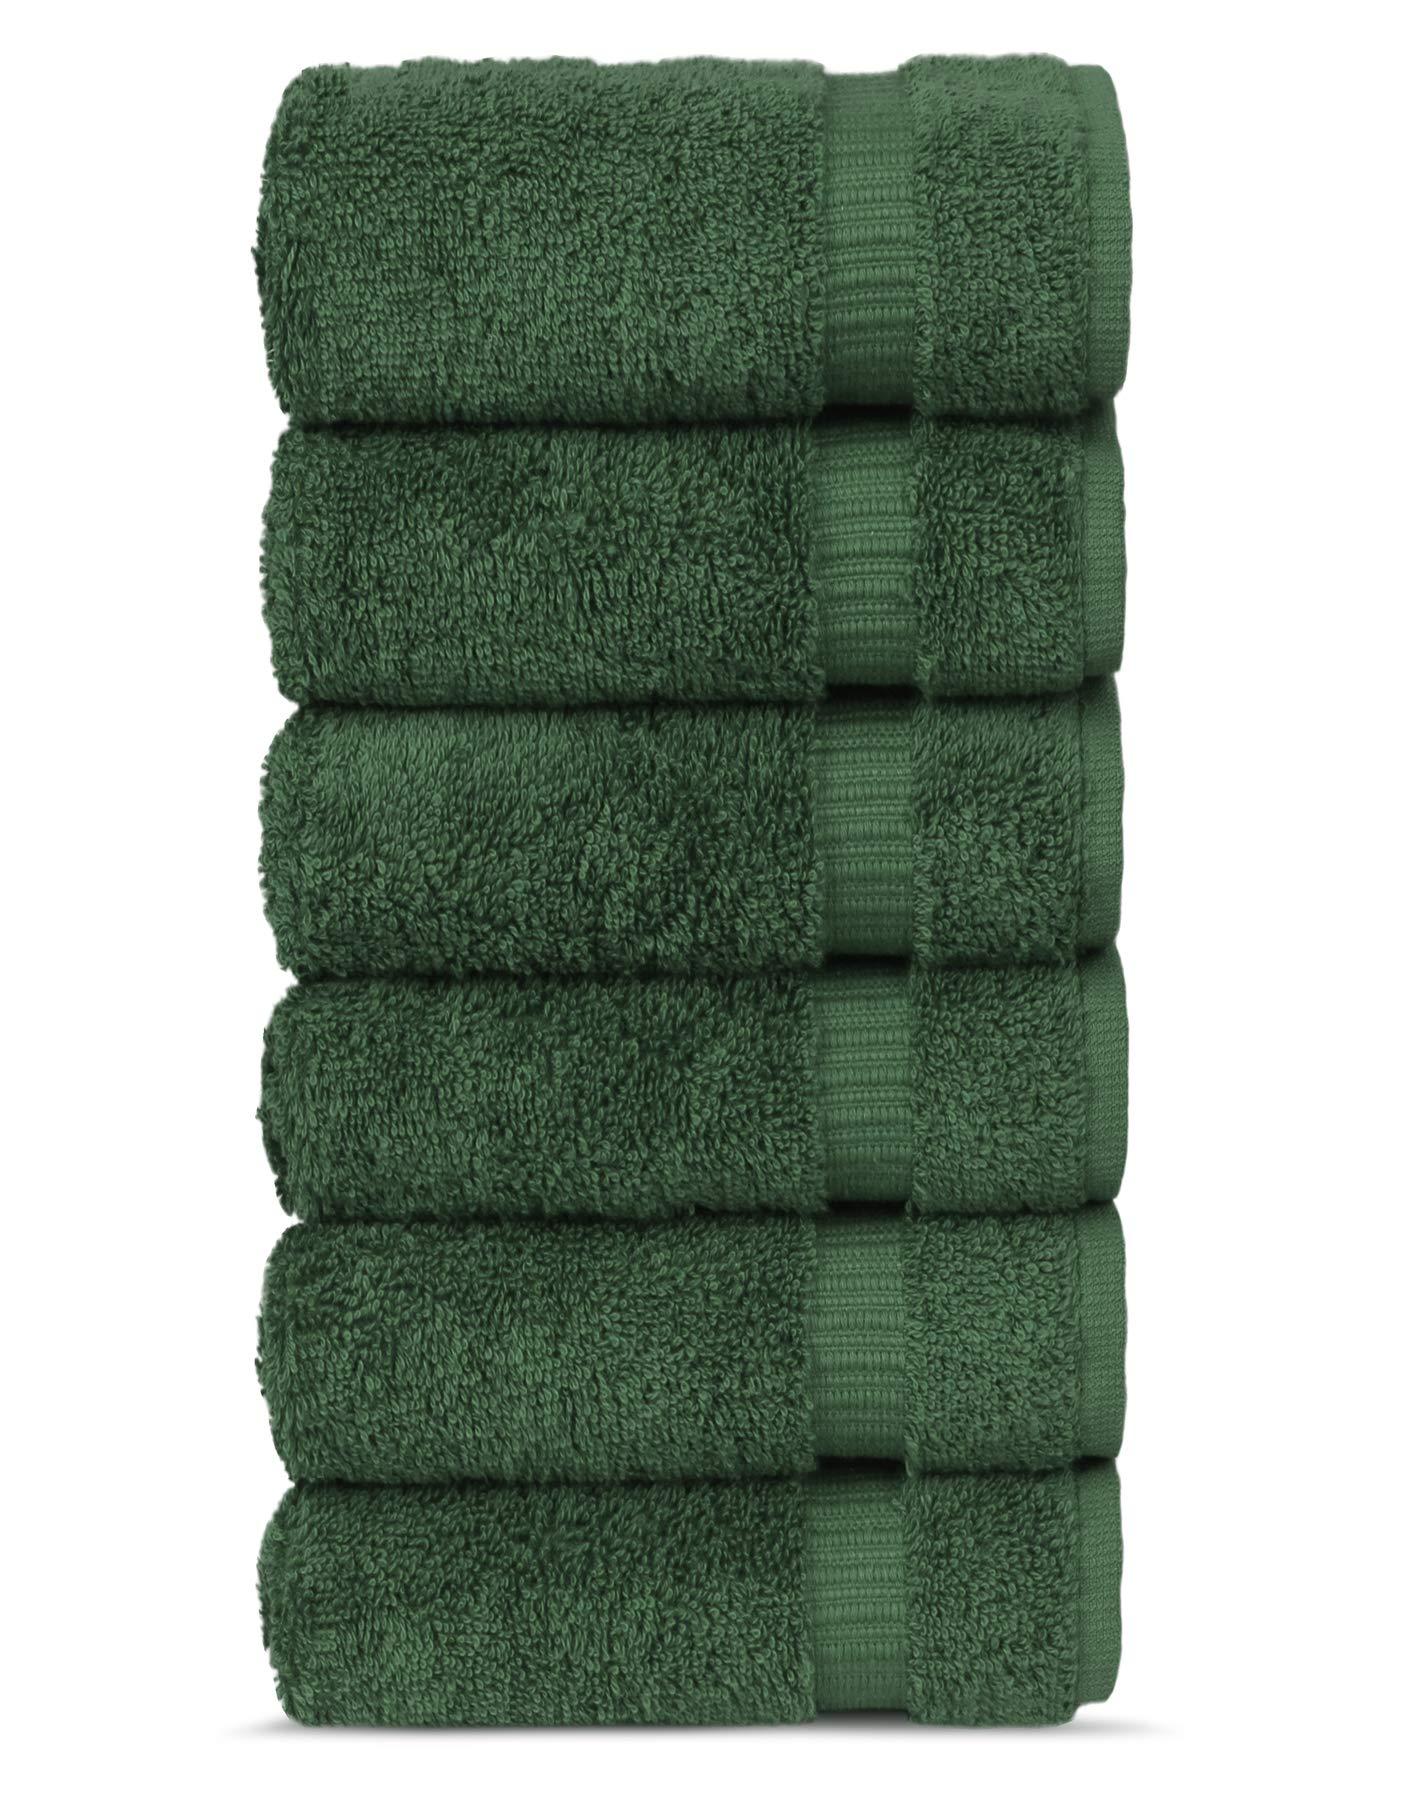 Chakir Turkish Linens Turkish Cotton 16x30 Luxury Hotel & Spa 6 Pack Hand Towel, Moss